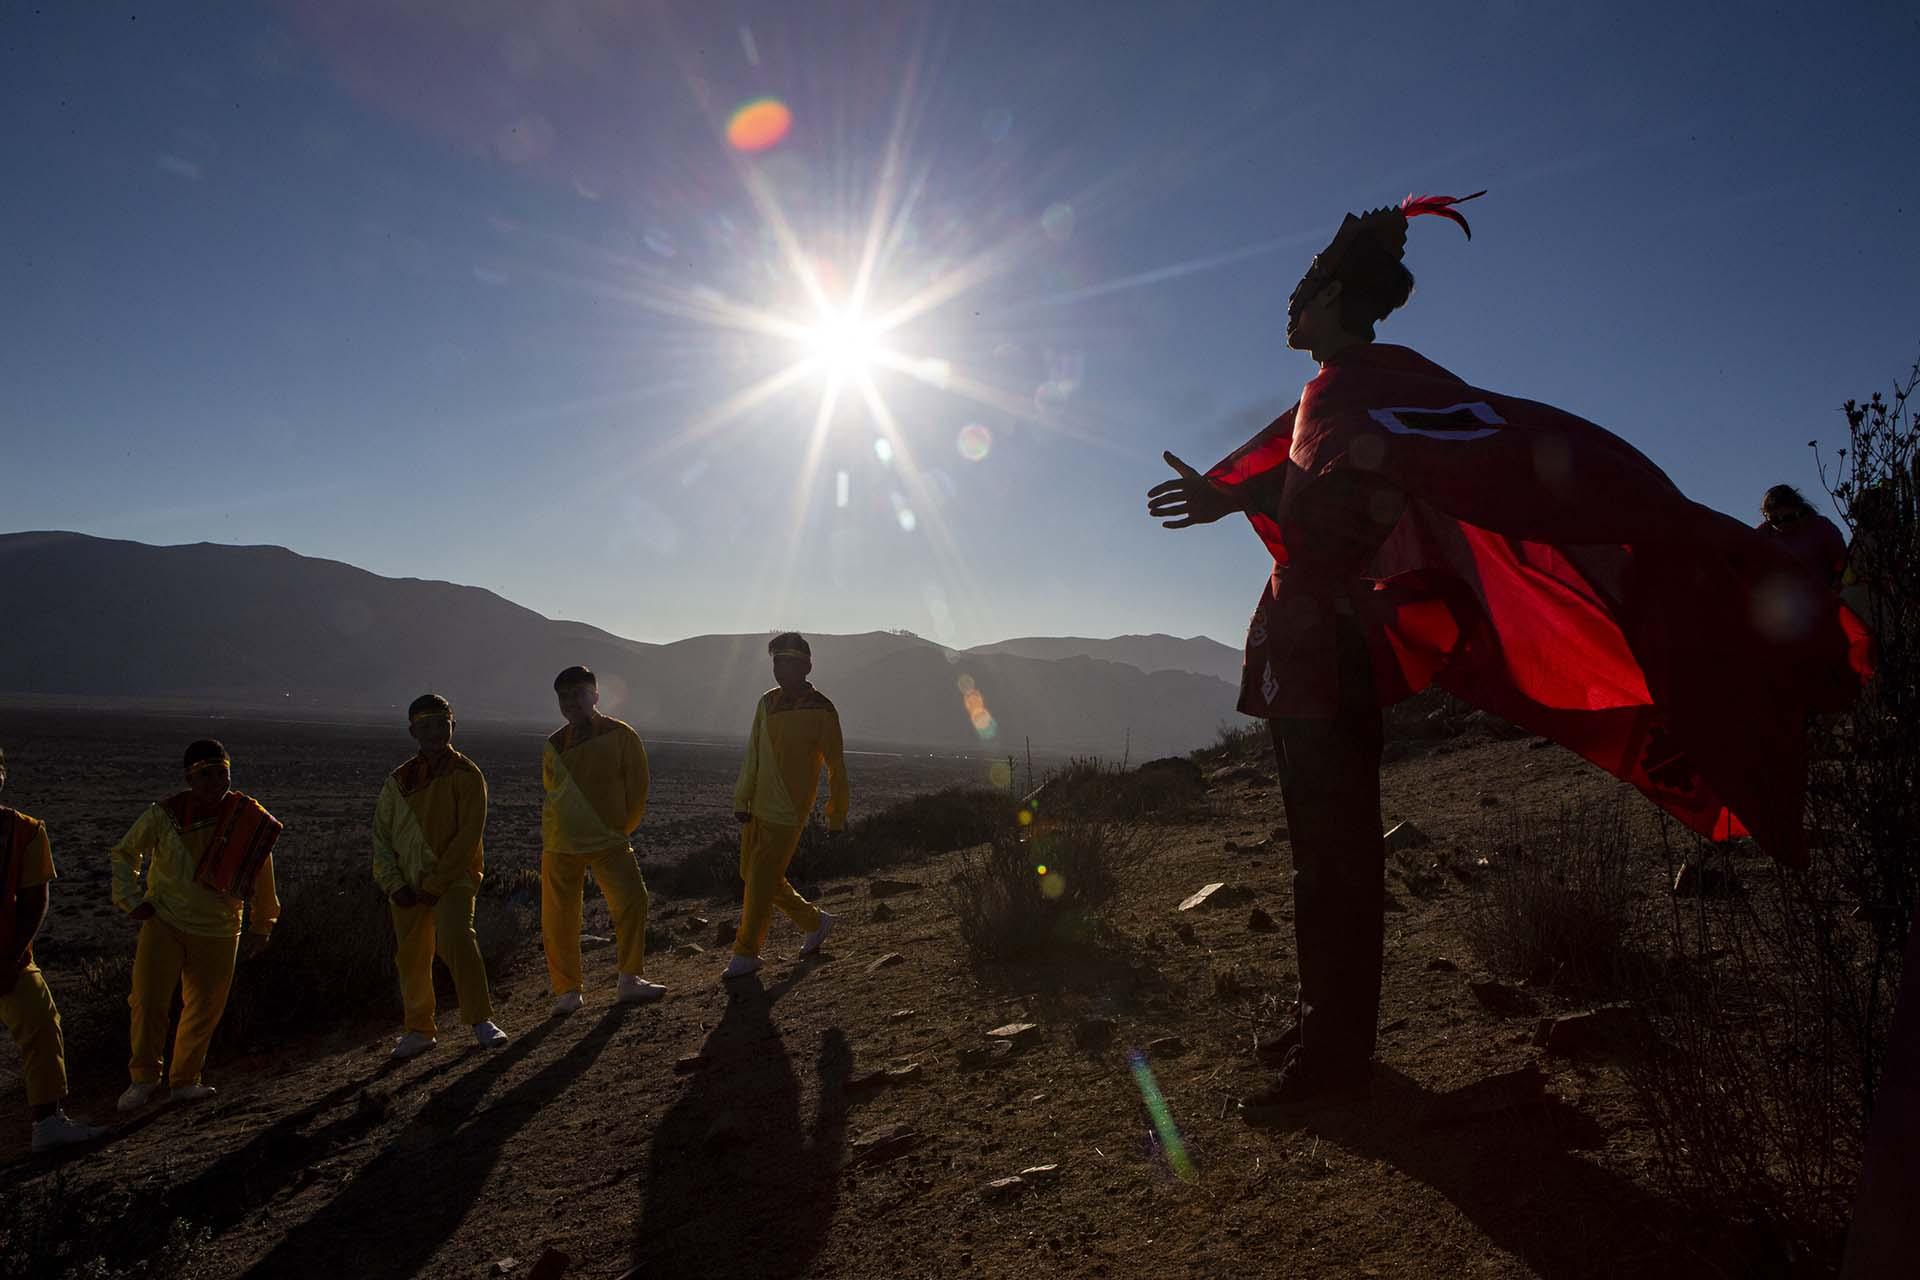 Un joven vestido de chamán en La Higuera antes del eclipse total de sol (AP Photo/Esteban Felix)